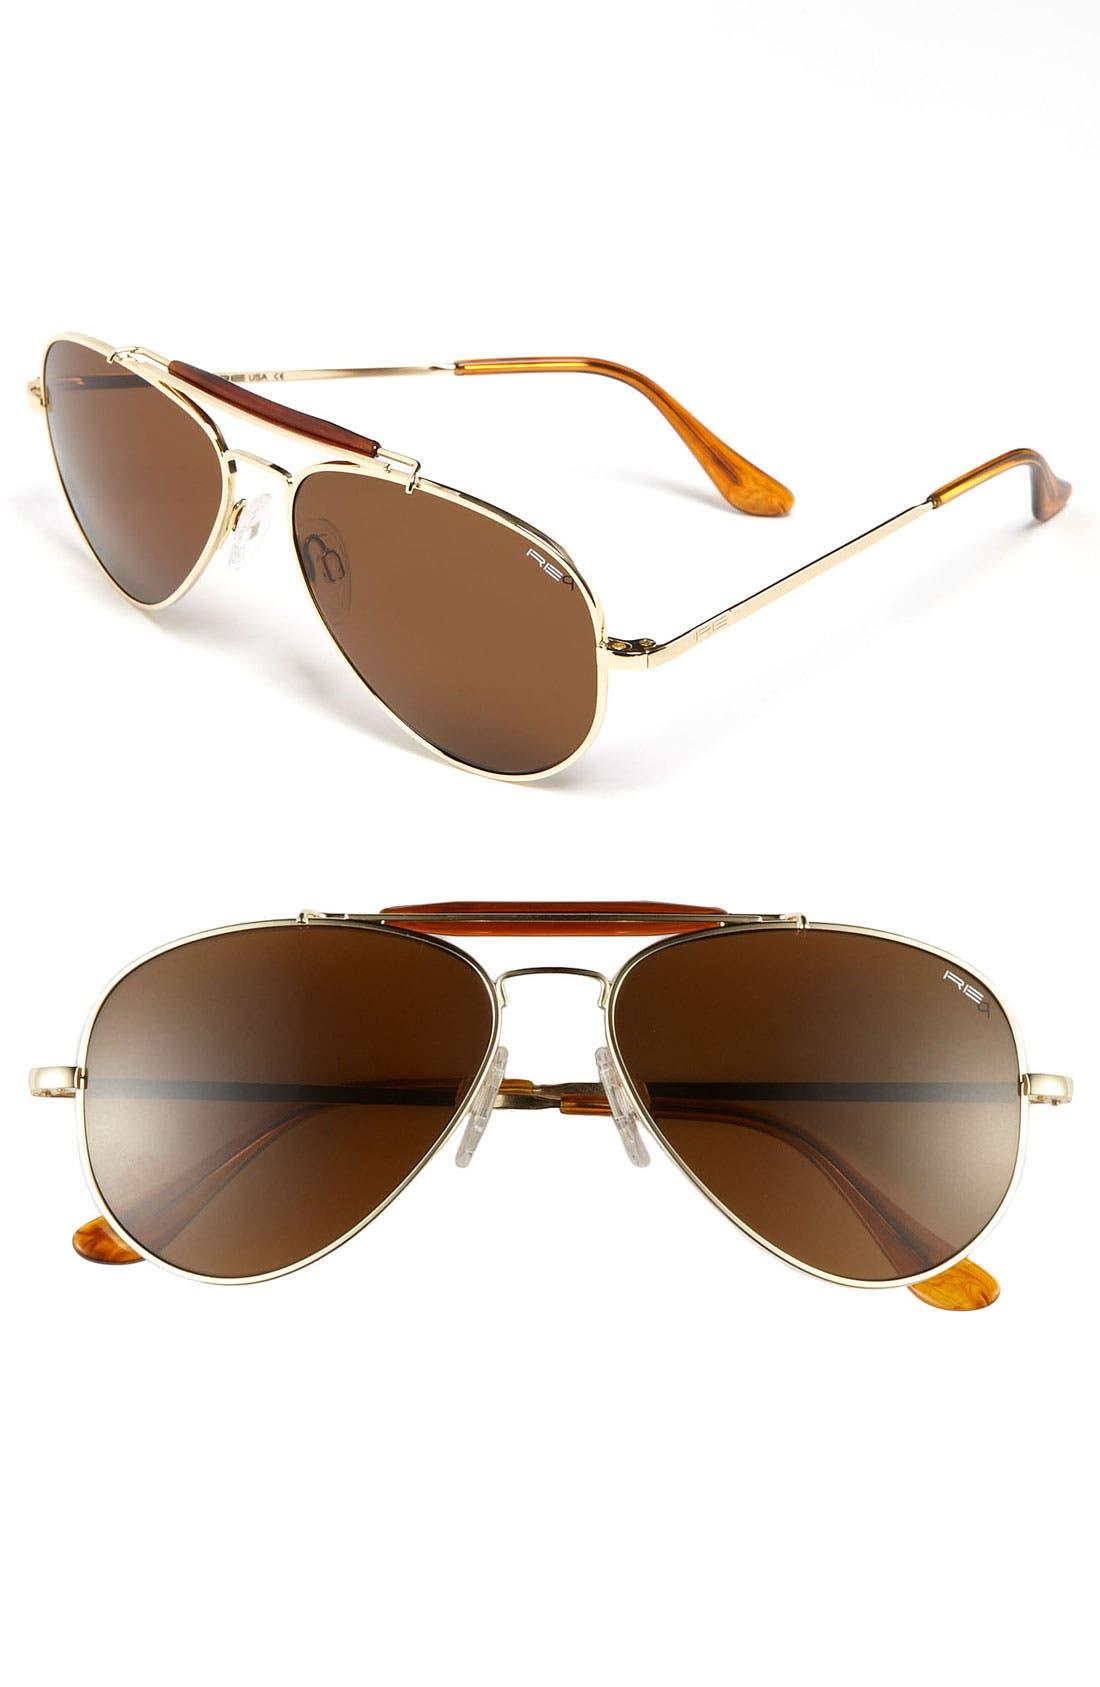 Main Image - Randolph Engineering 'Sportsman' 57mm Polarized Sunglasses